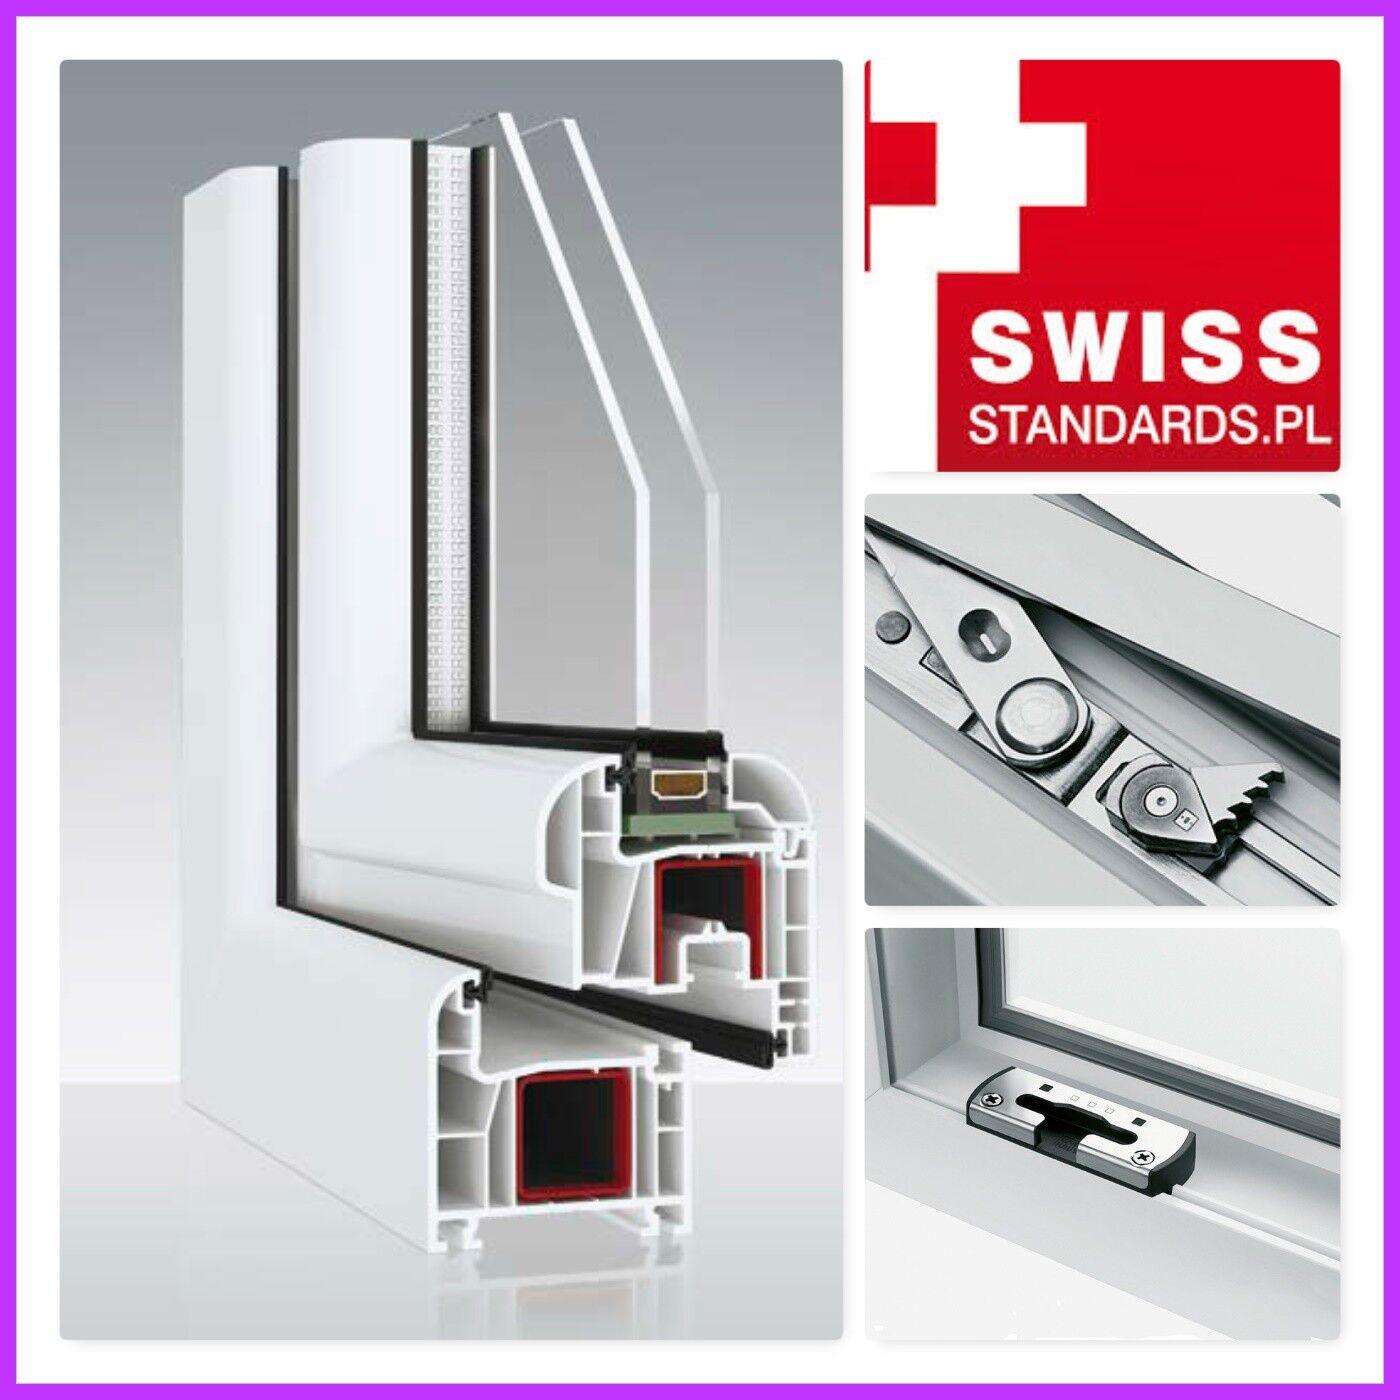 Kunststofffenster Weiß Dreh Kipp 2 oder 3 Fach Verglast 1 flg. Avantgarde 9000